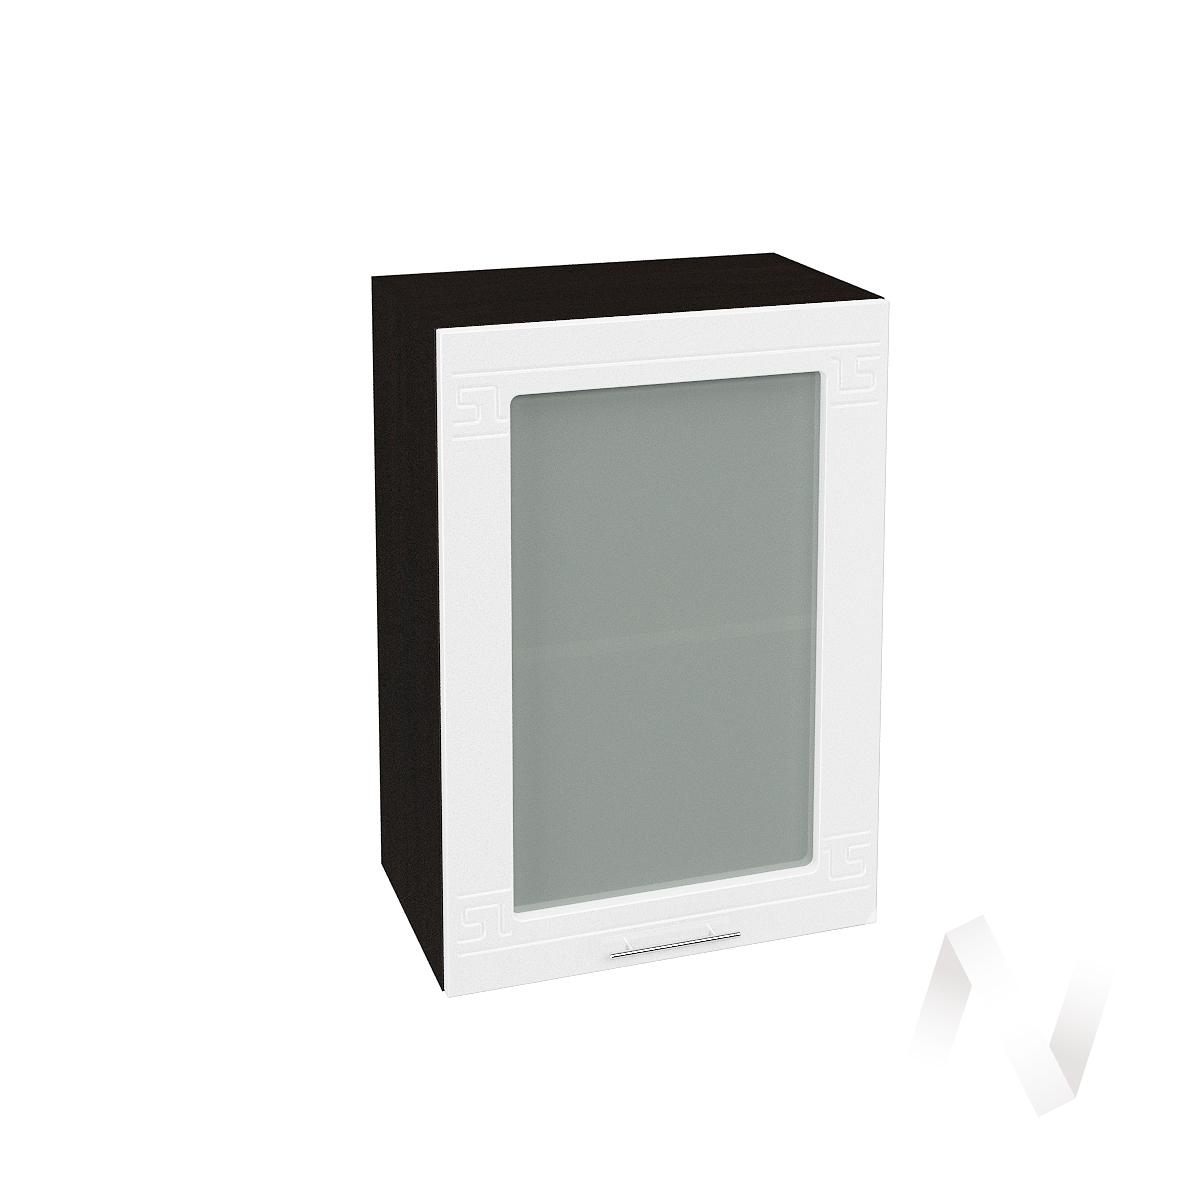 "Кухня ""Греция"": Шкаф верхний со стеклом 500, ШВС 500 (белый металлик/корпус венге)"